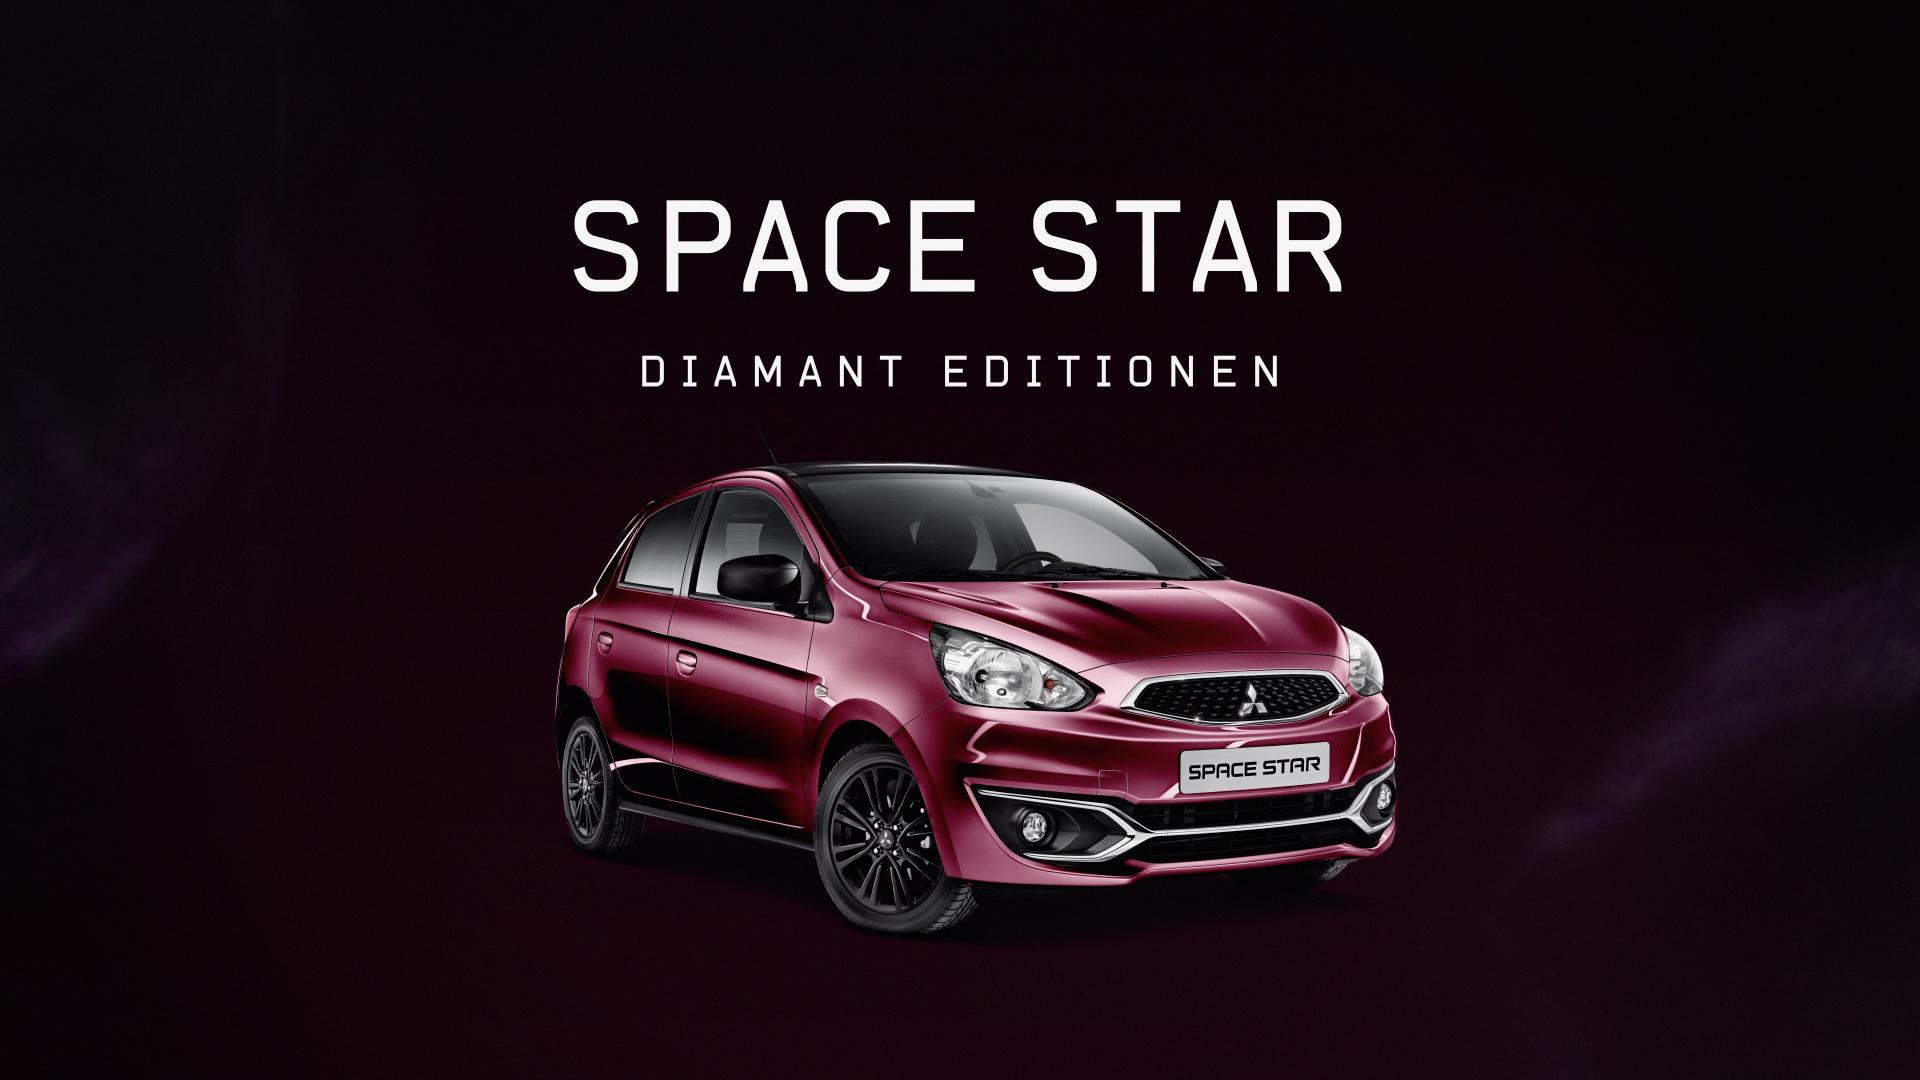 blokstudio Automobile Mitsubishi Diamant Edition Space Star